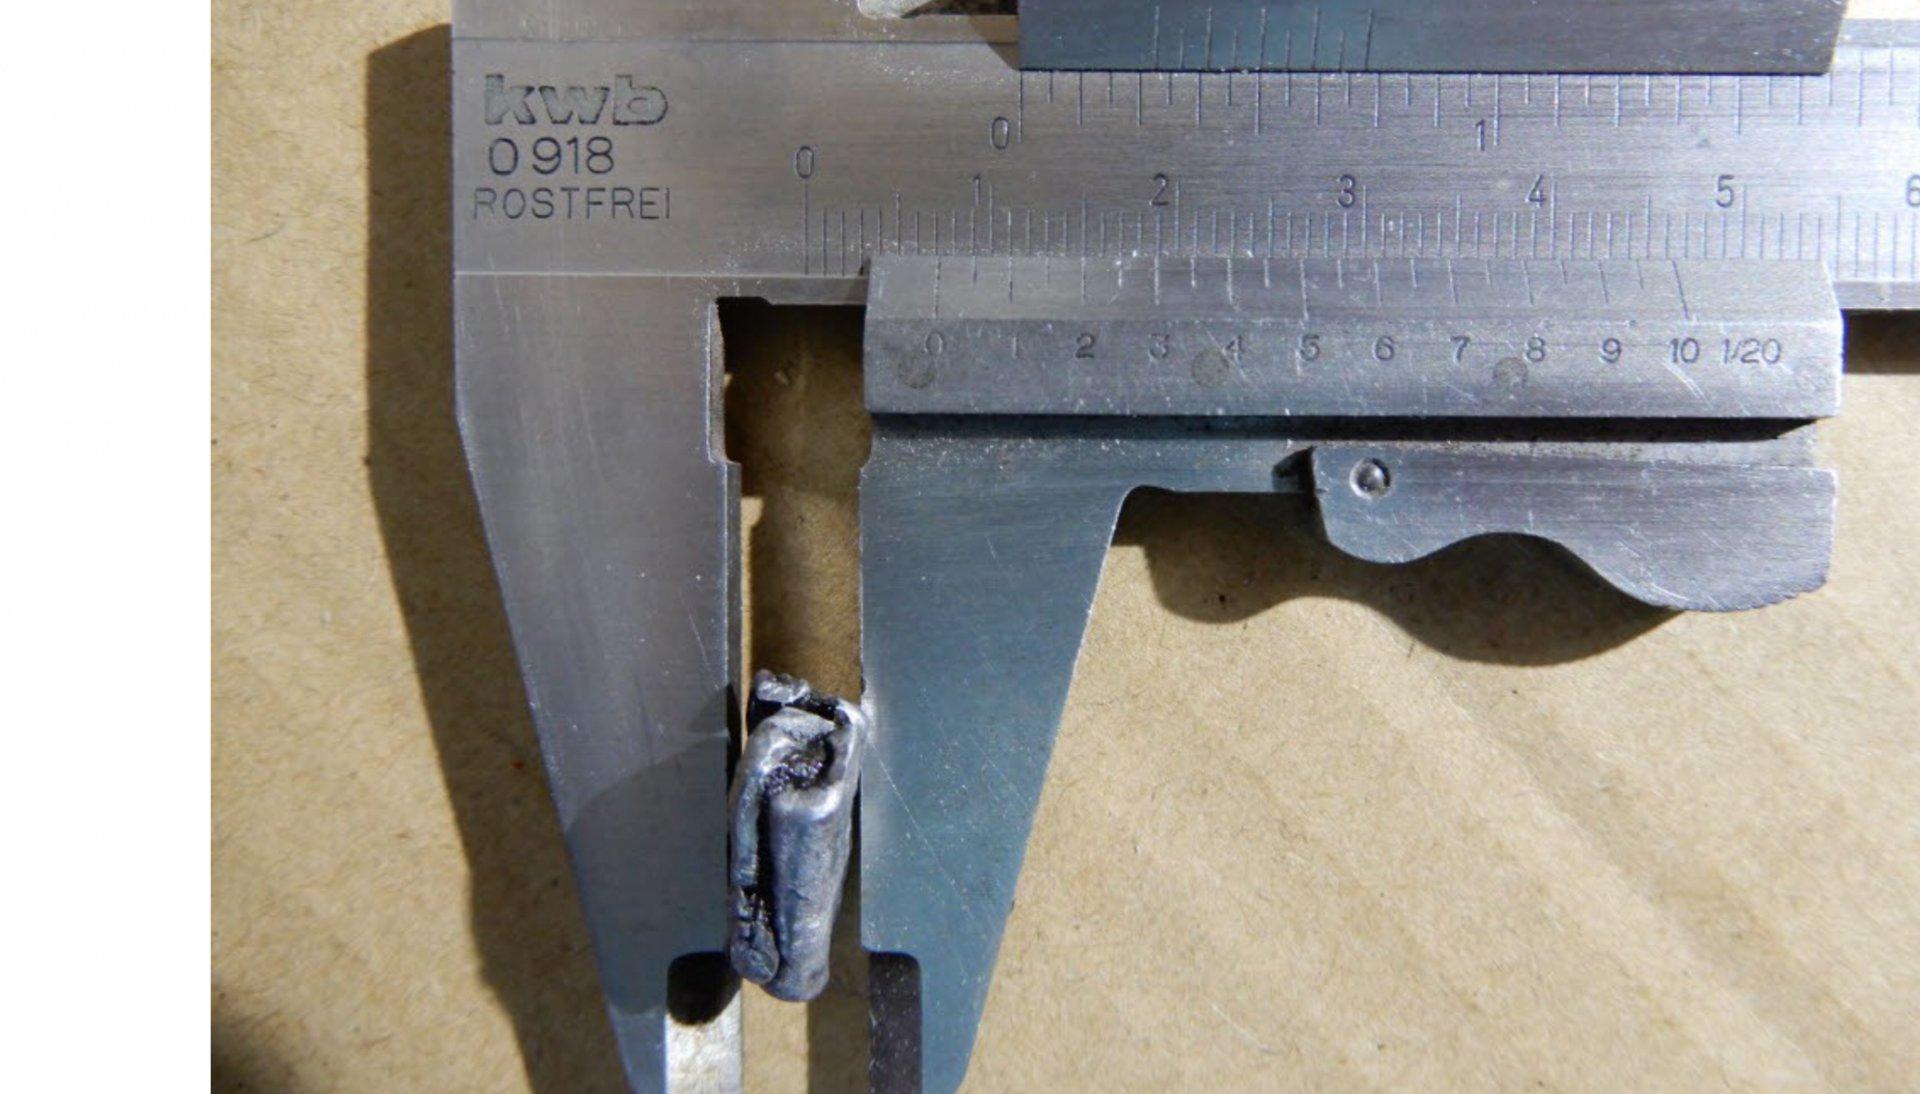 F9EAD6E1-98C8-45FD-A9F0-A51A7ADF1AC0.jpeg